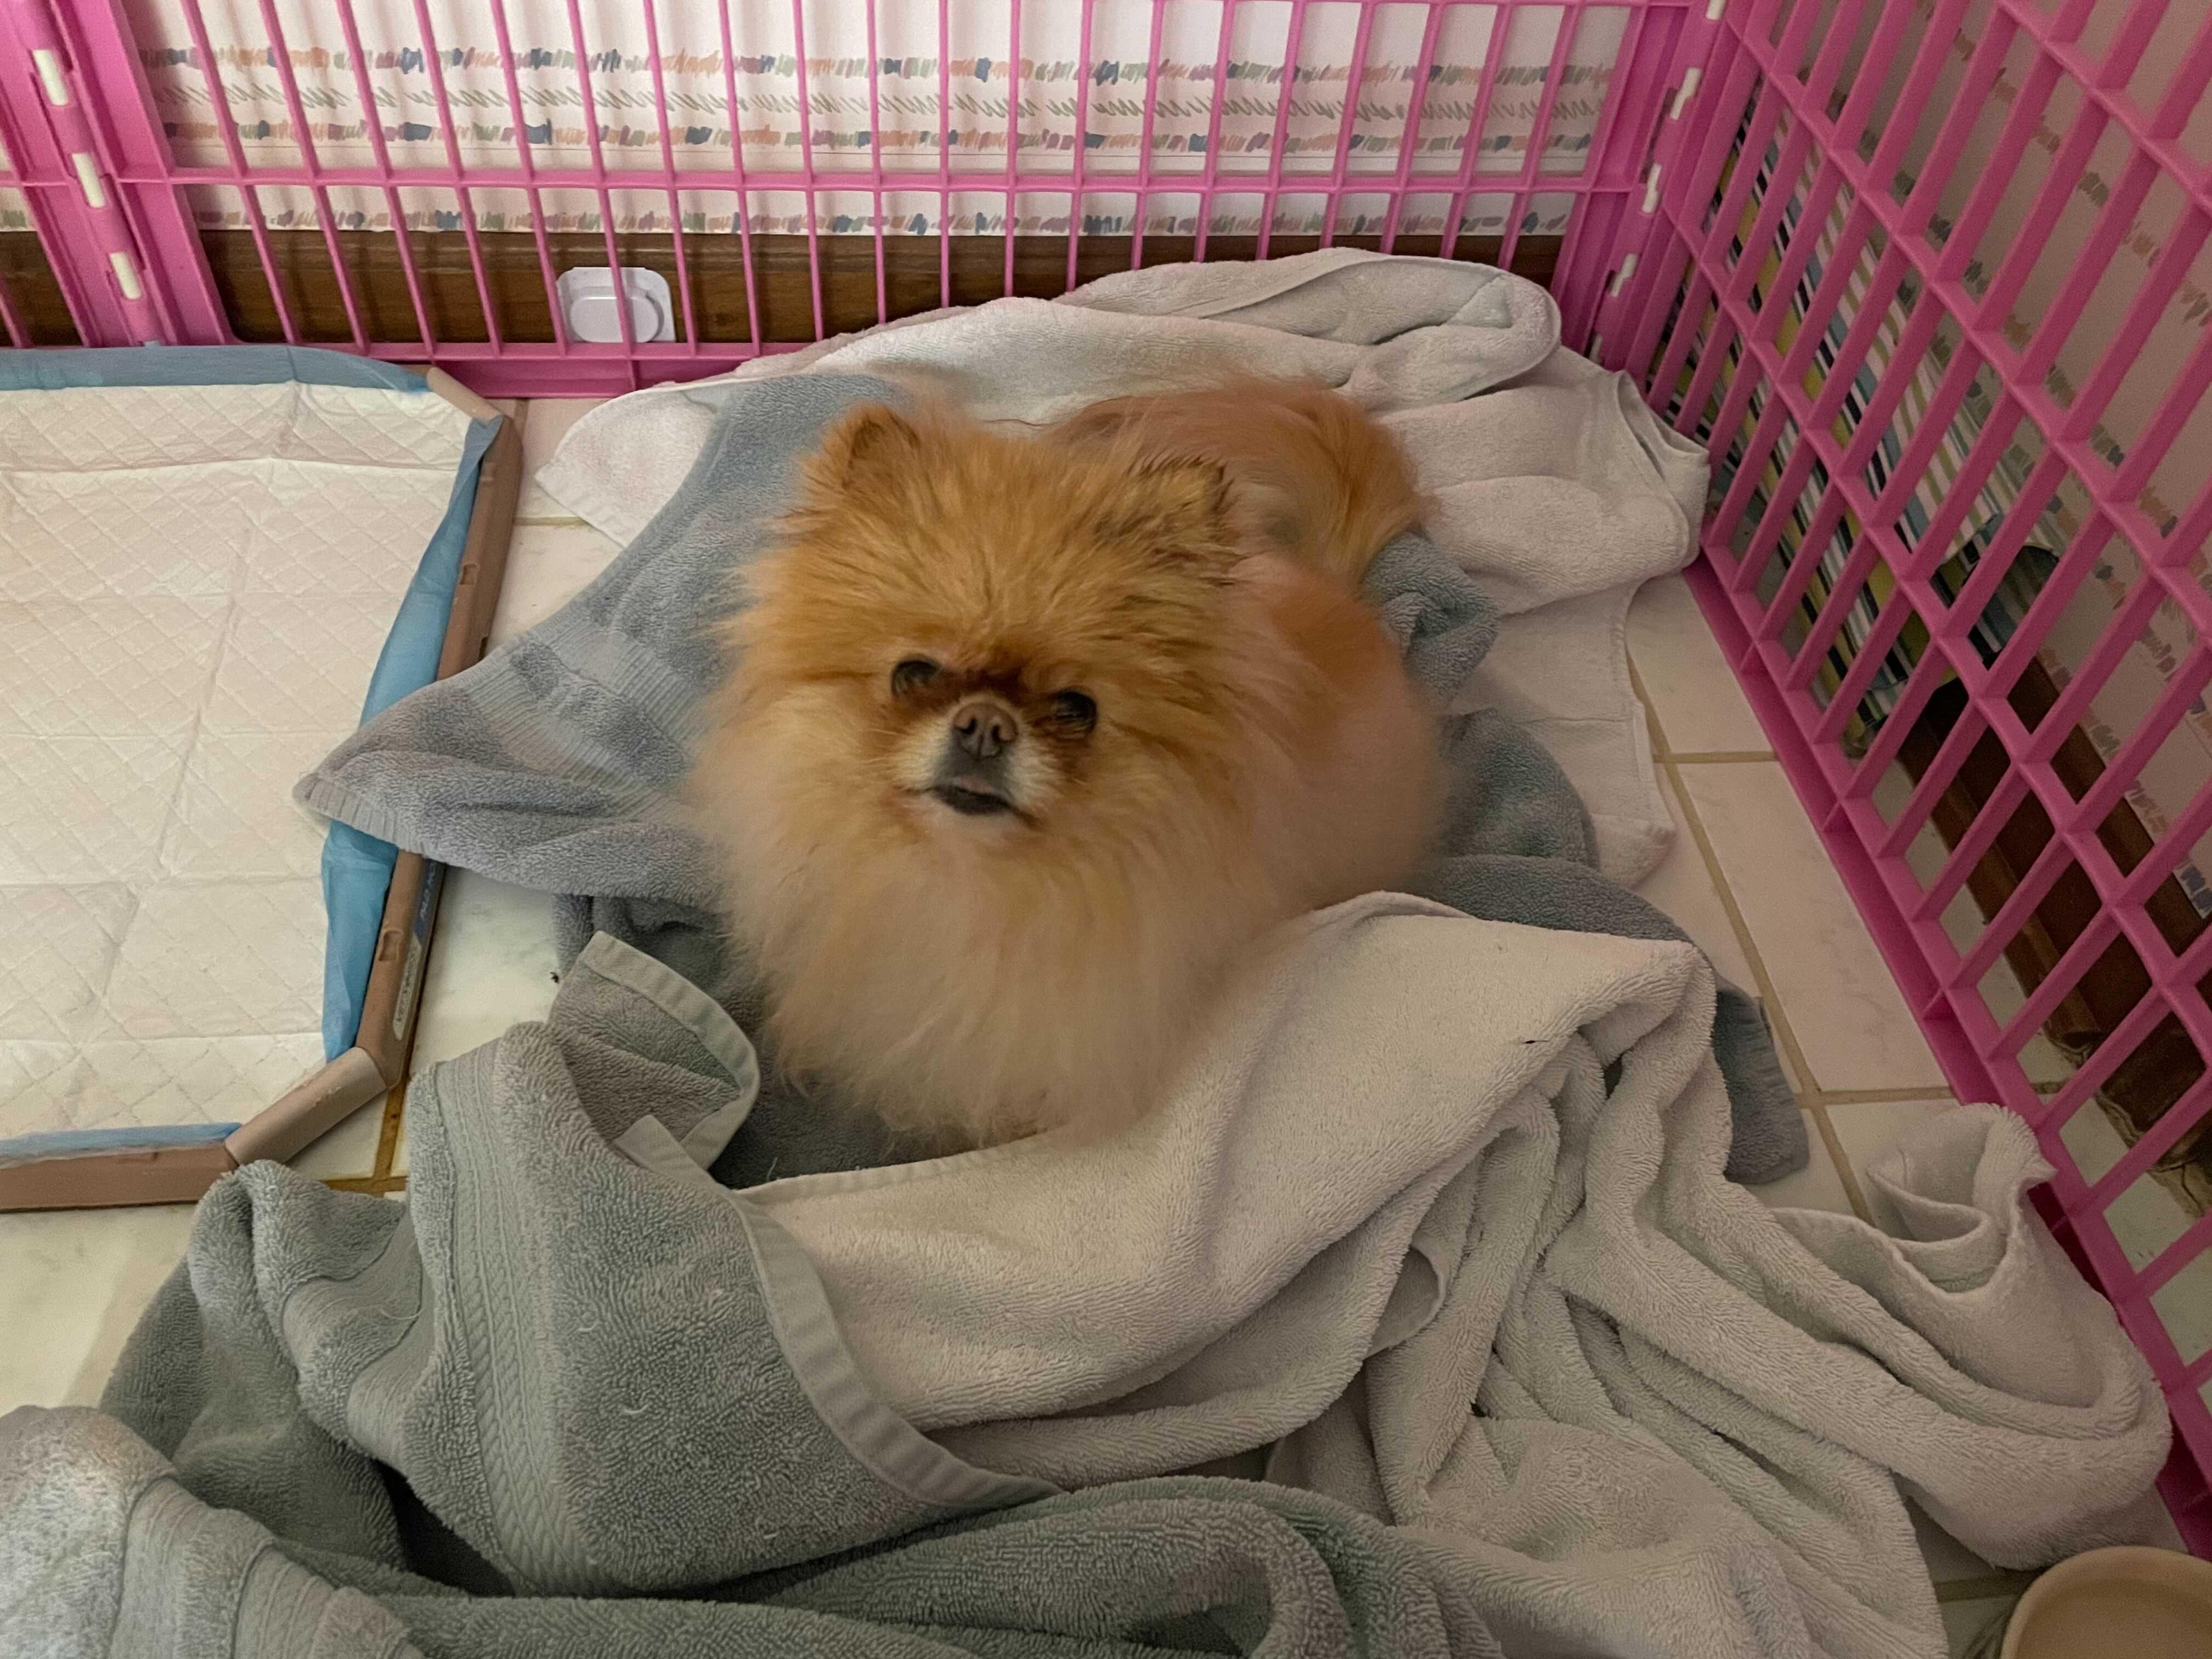 Lola after her bath.